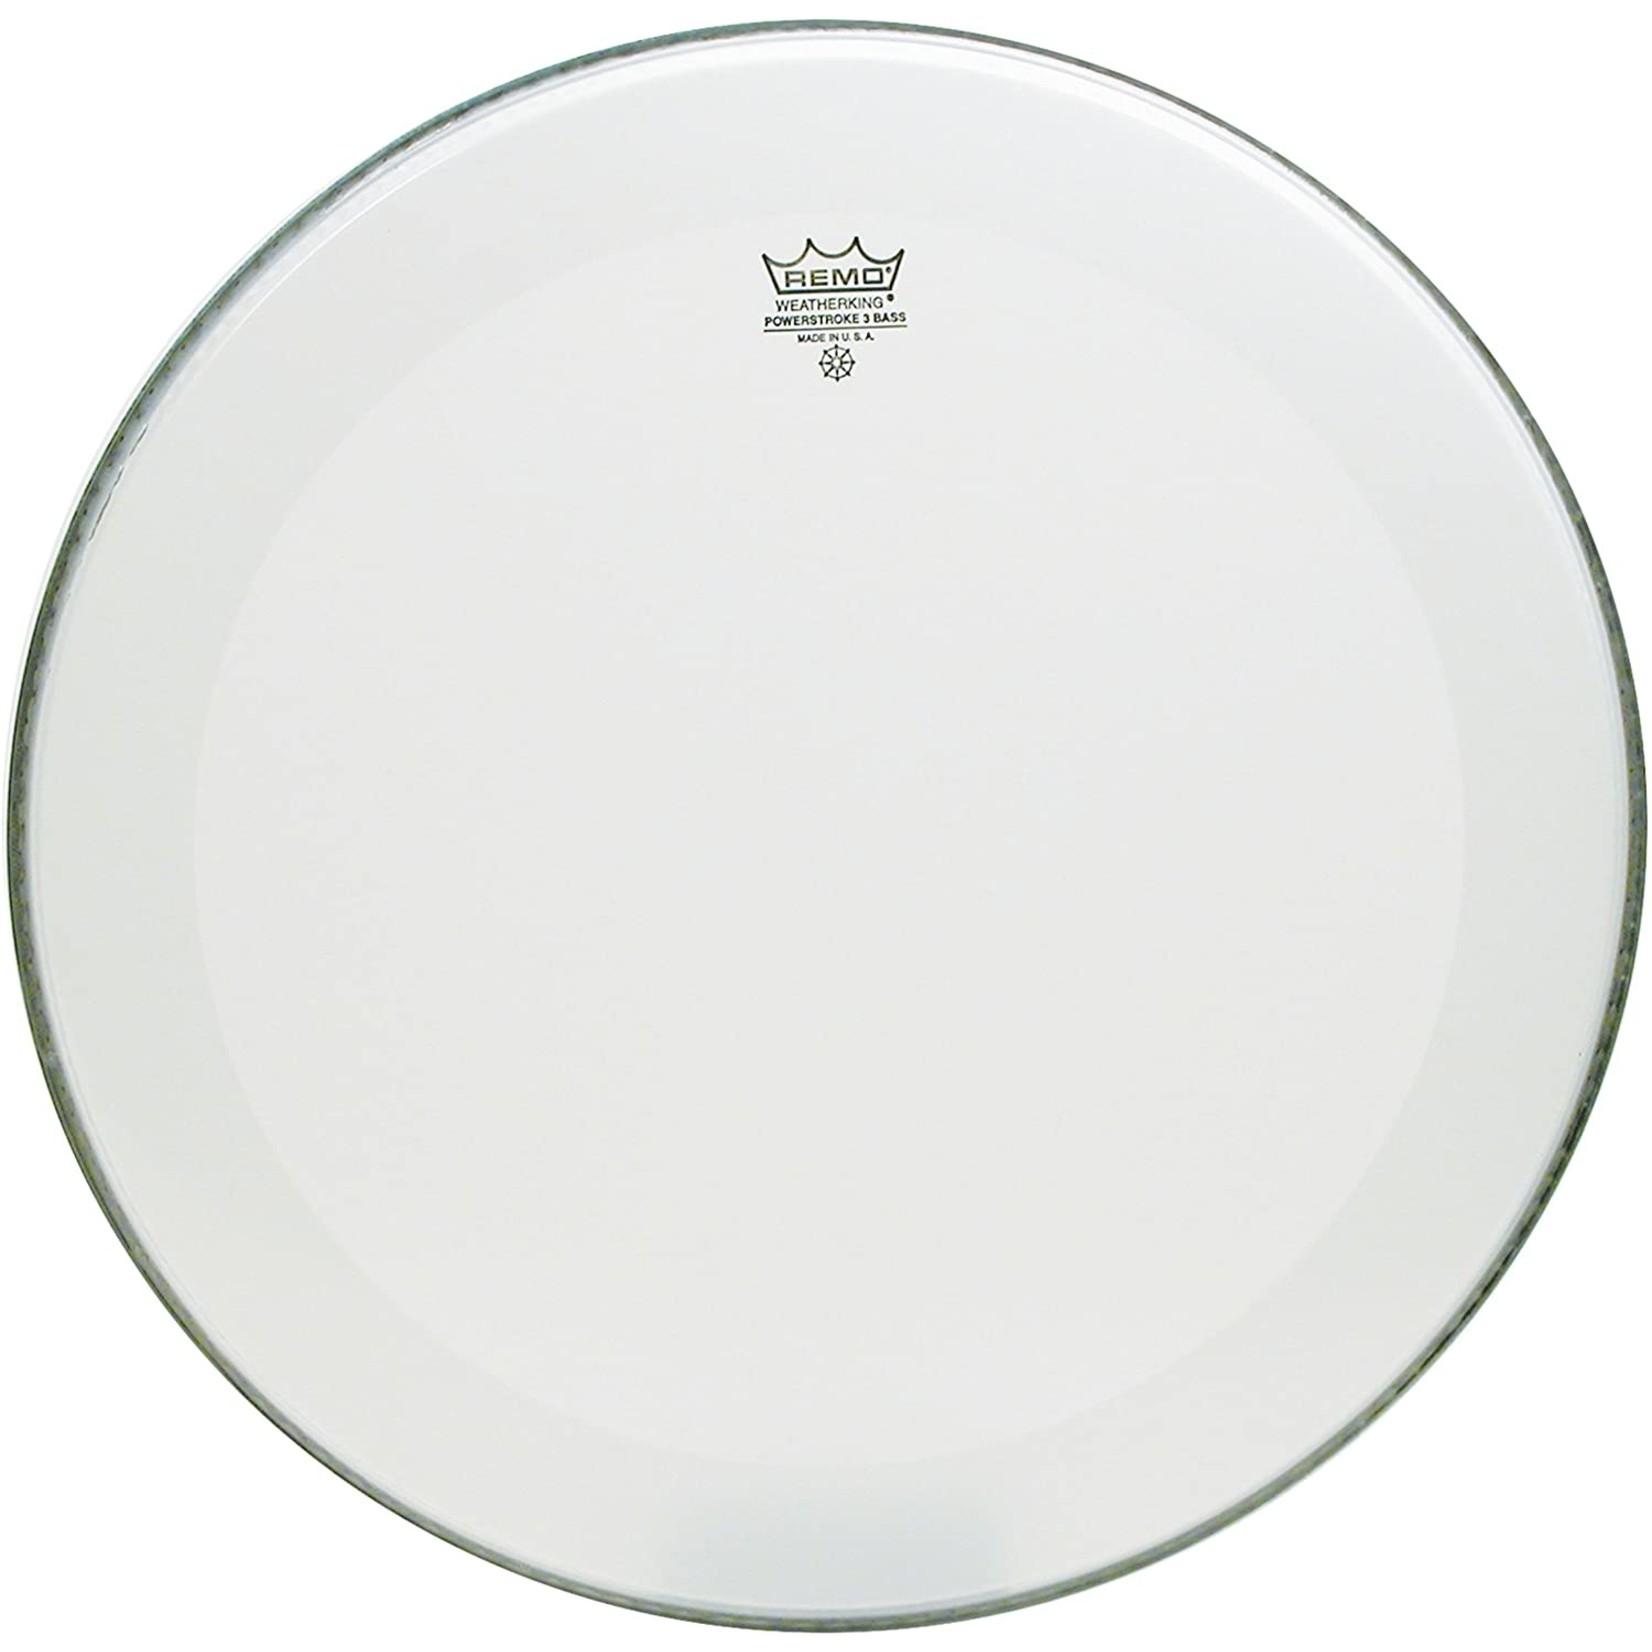 Remo Remo Smooth White Powerstroke 3 No Stripe Bass Drum